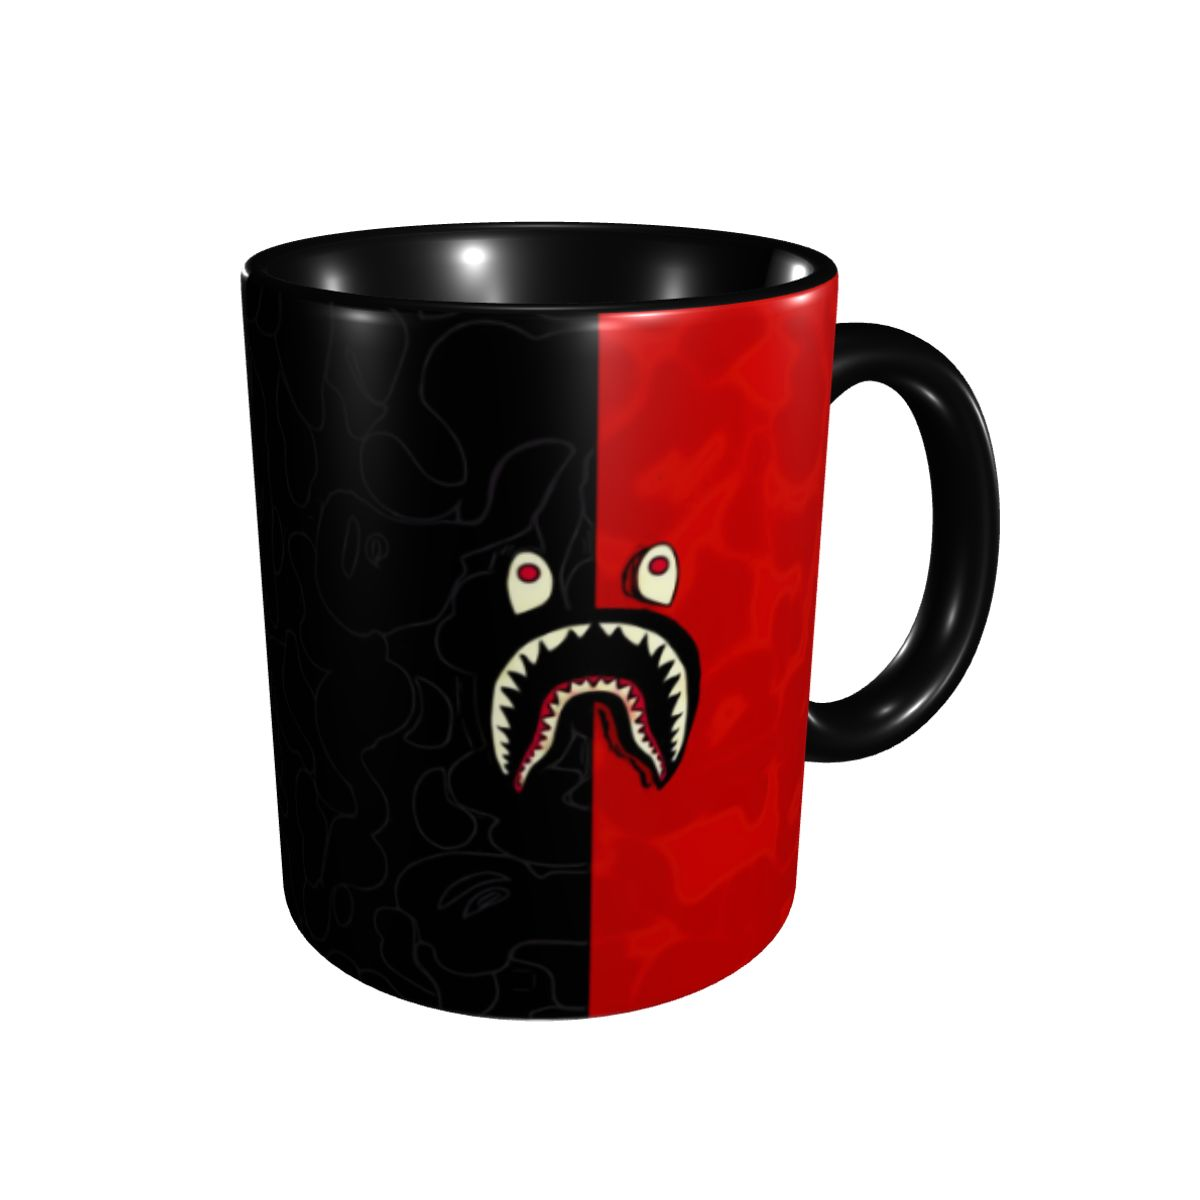 BAPE fashion and популярные чашки, кофейные чашки, молочные чашки, чайные чашки, керамические материалы